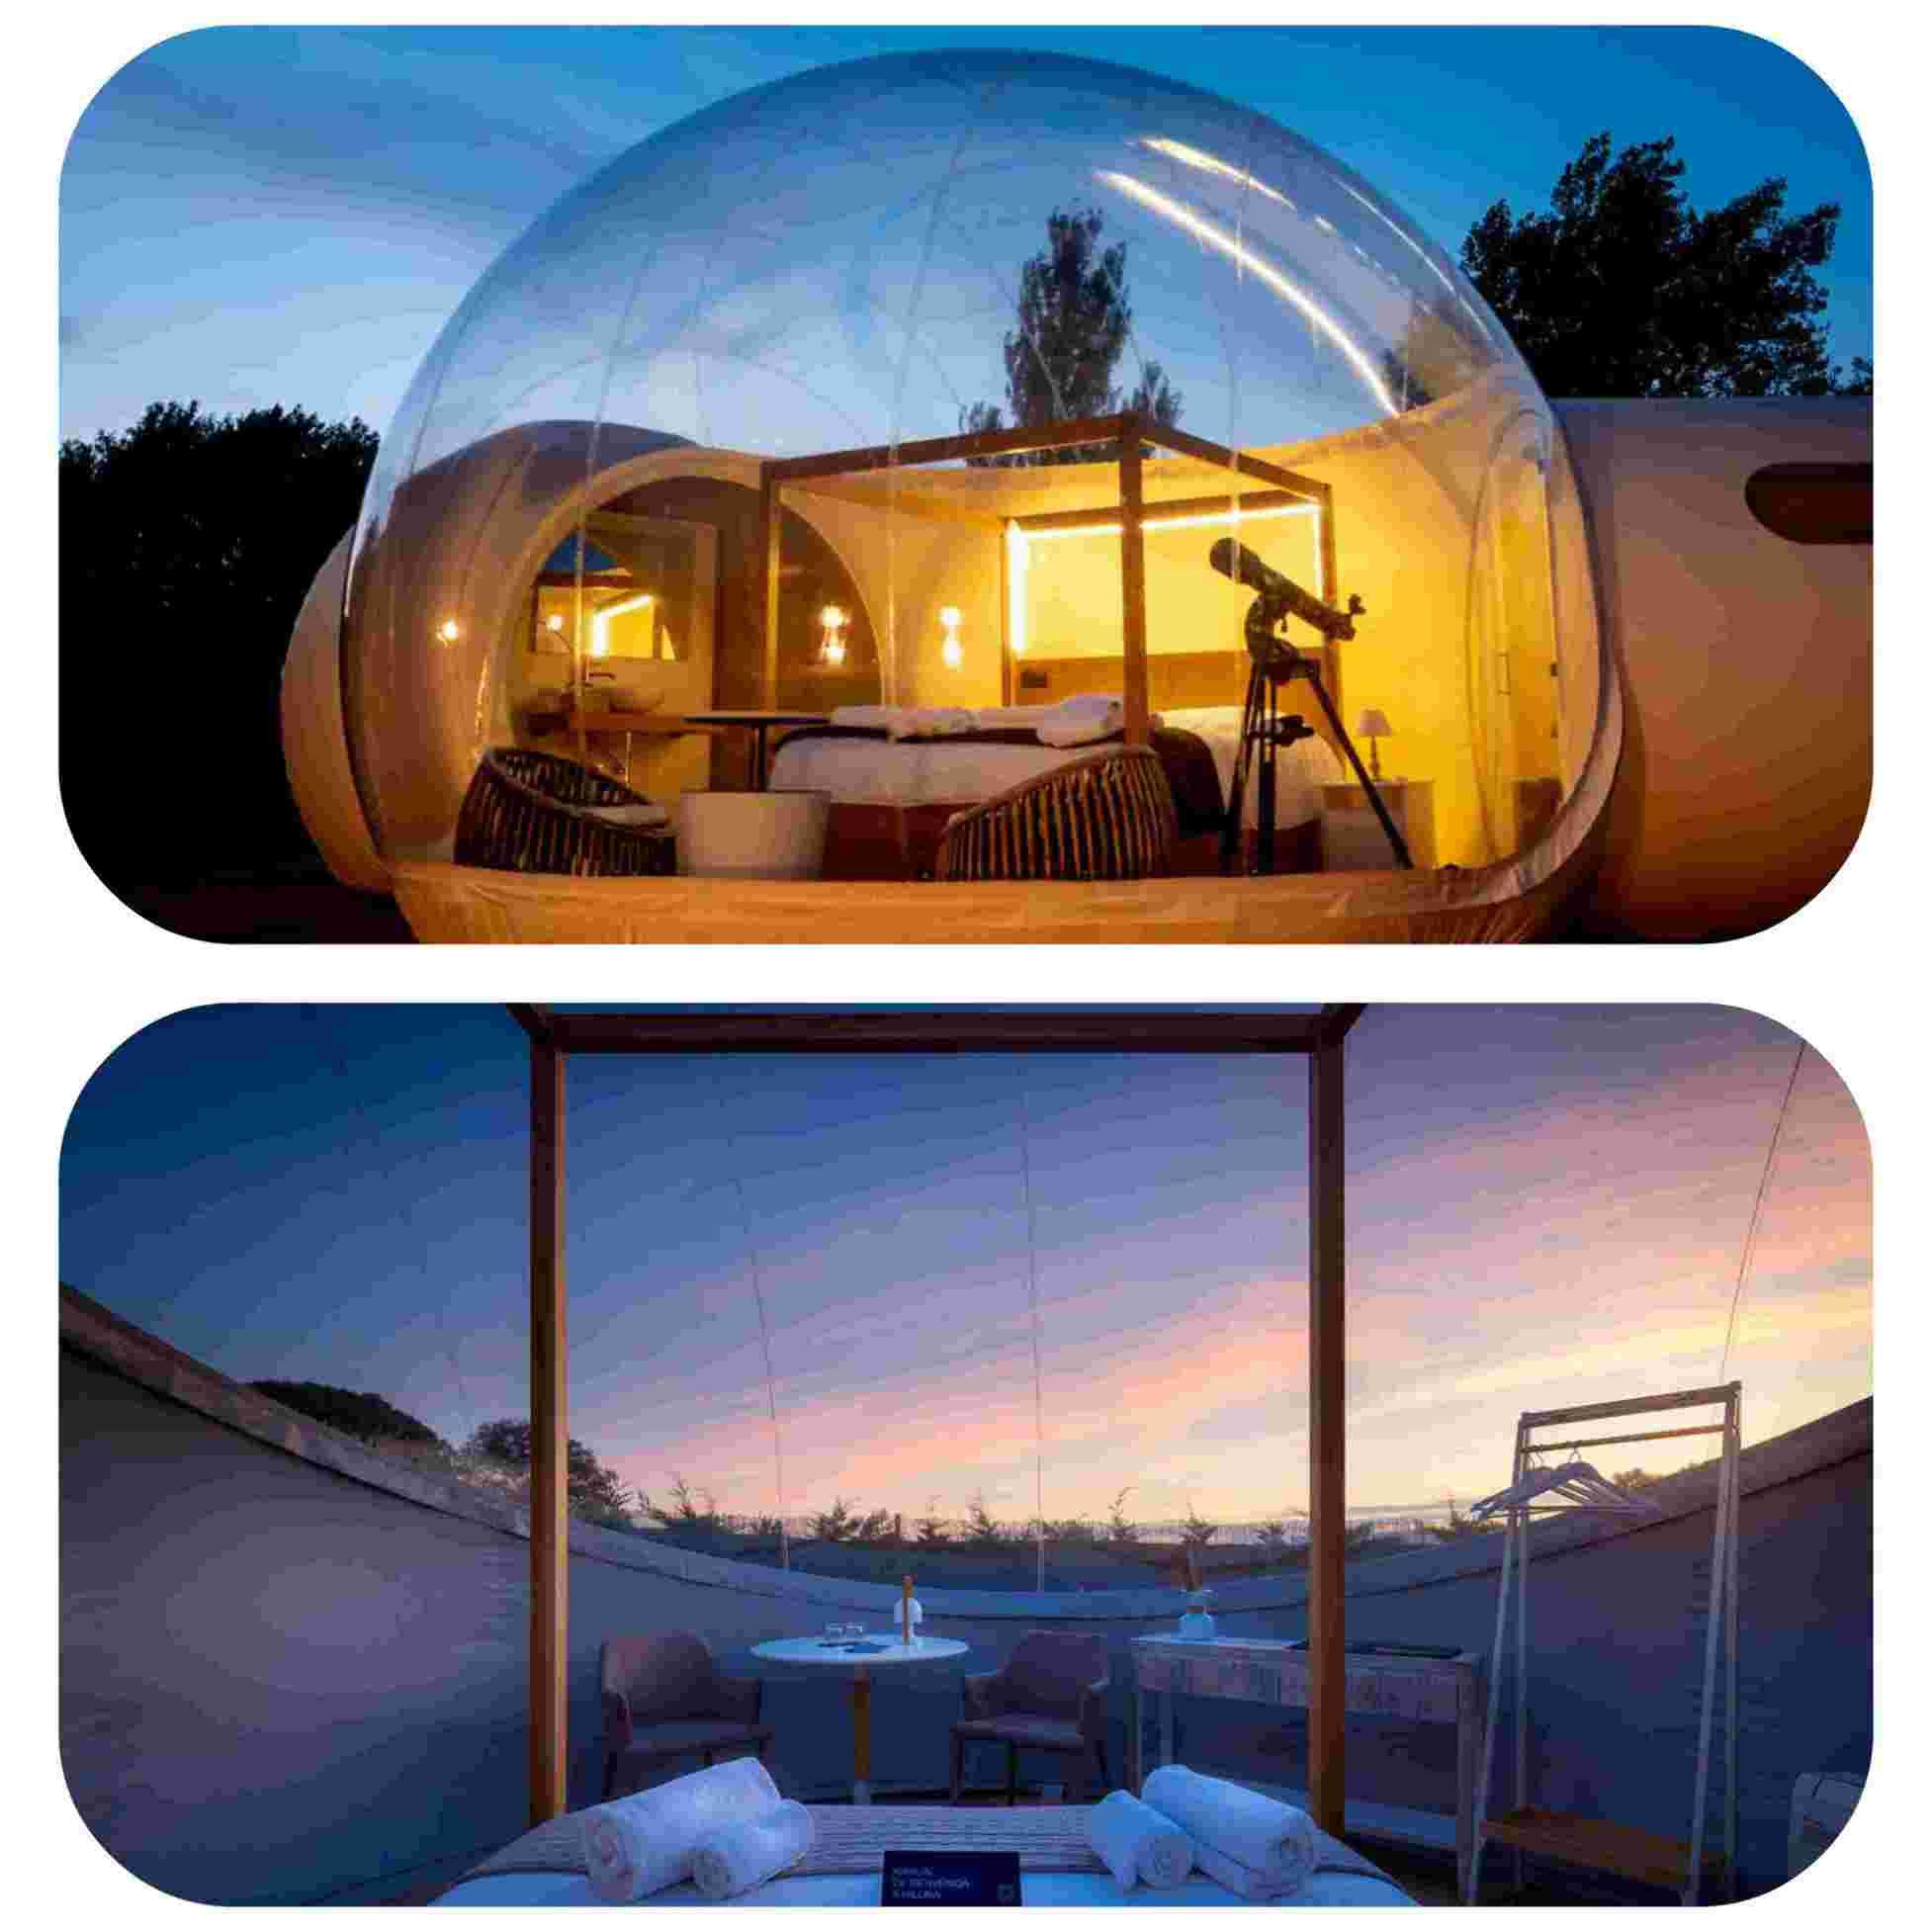 hotel-burbuja-alojamiento-glamping